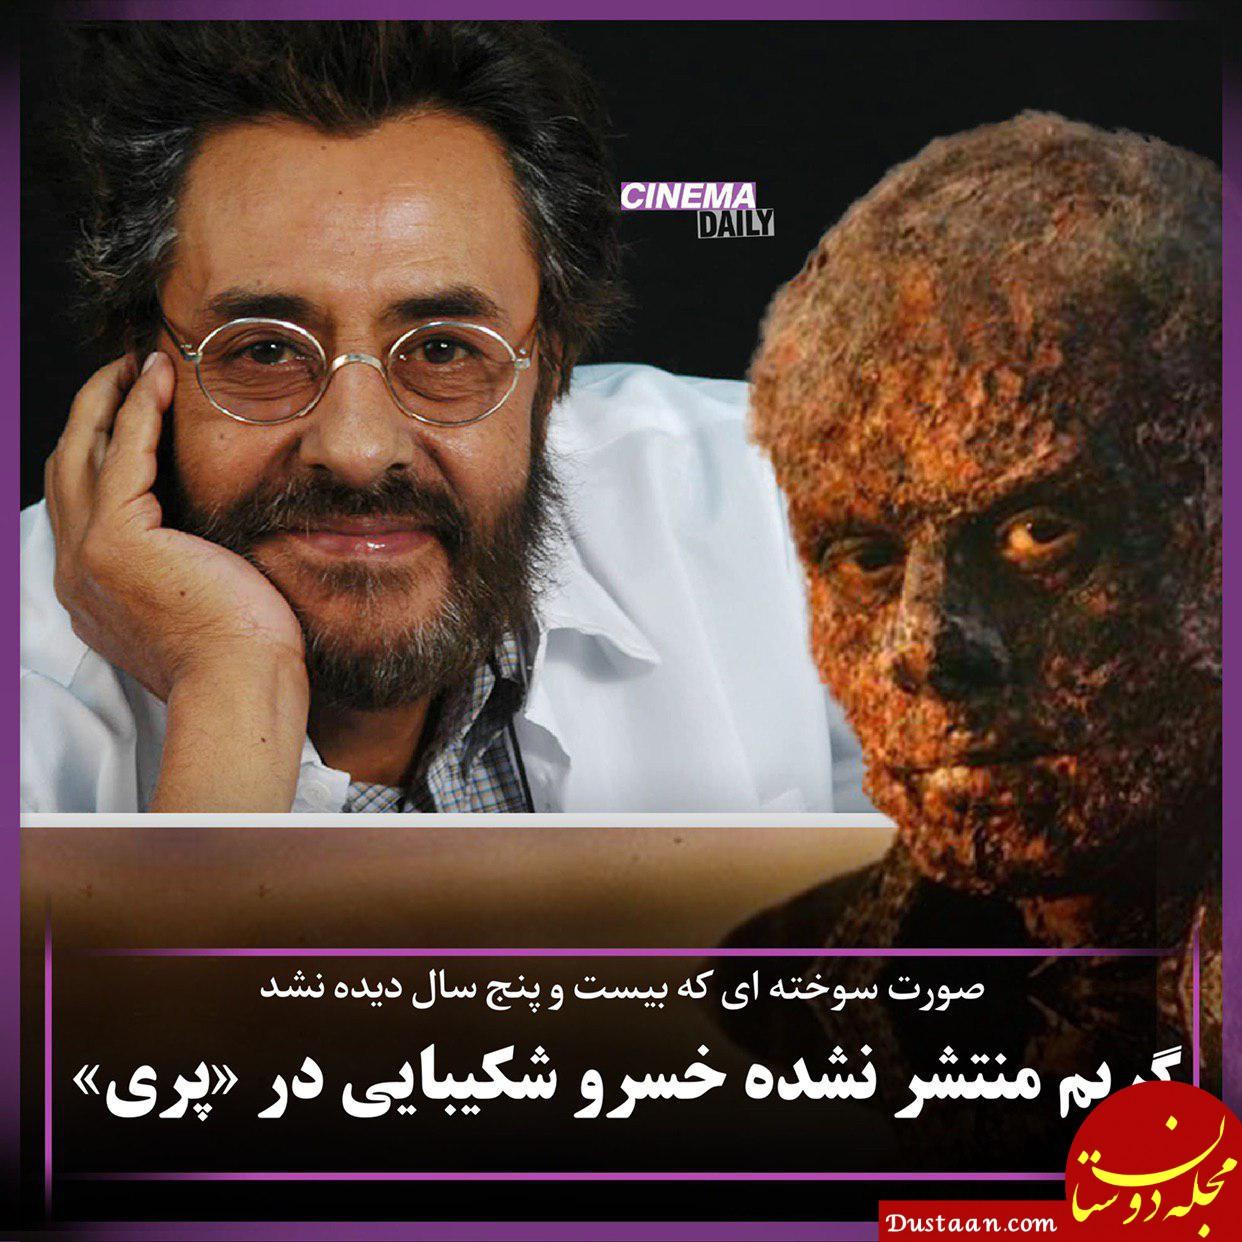 www.dustaan.com صورت سوخته خسرو شکیبایی که هیچگاه پخش نشد +عکس